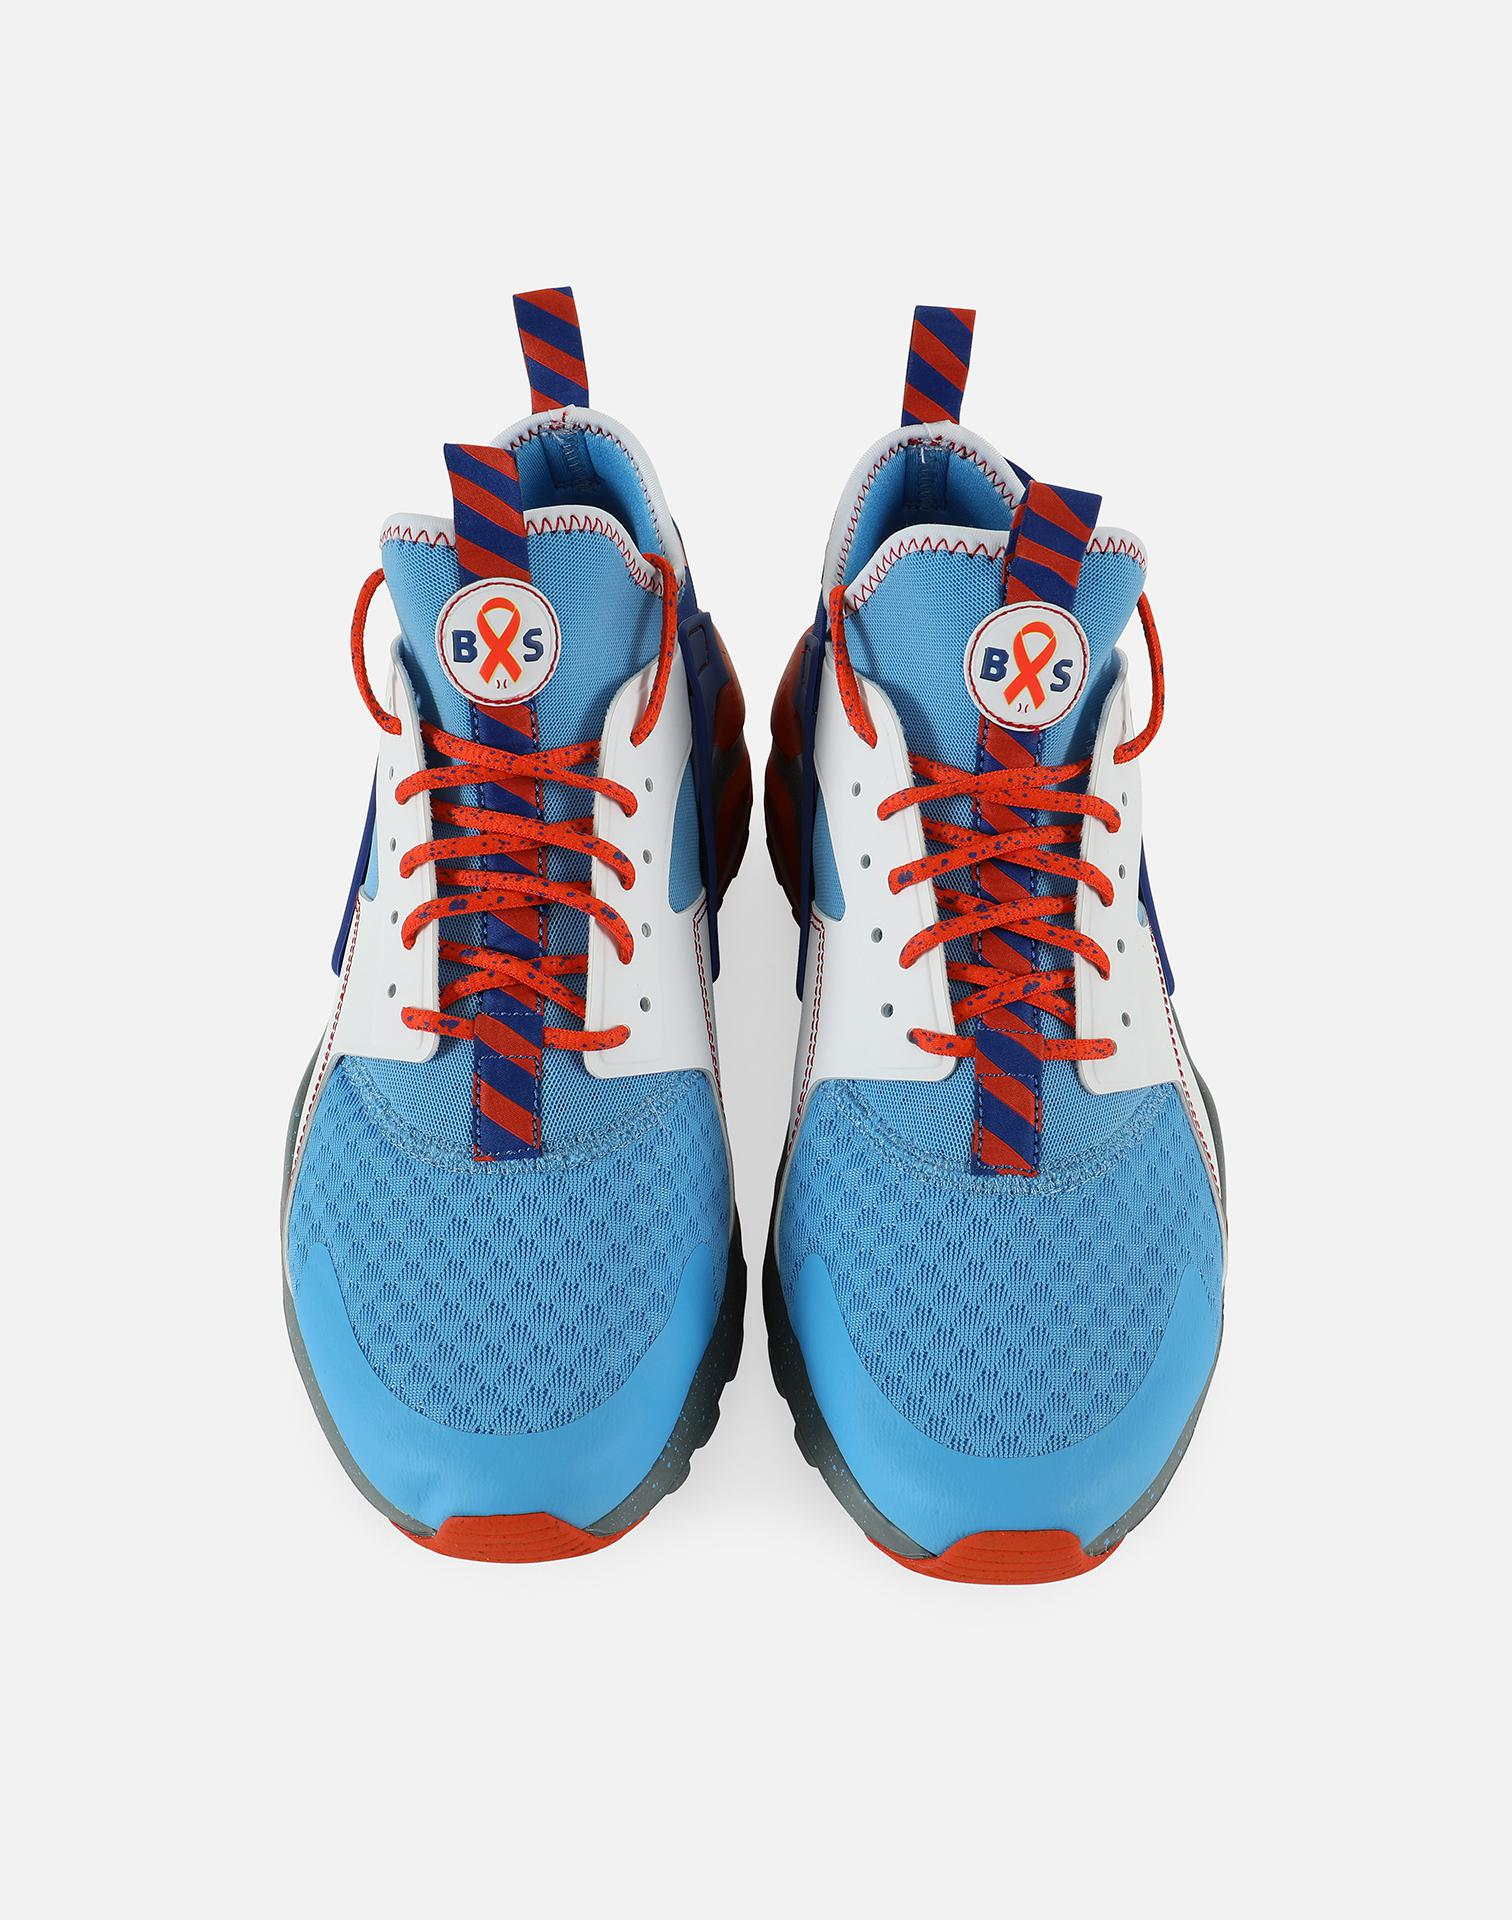 fbb3f690139e5 ... Lyst - Nike Air Huarache Run Ultra Doernbecher in Blue for Men ...